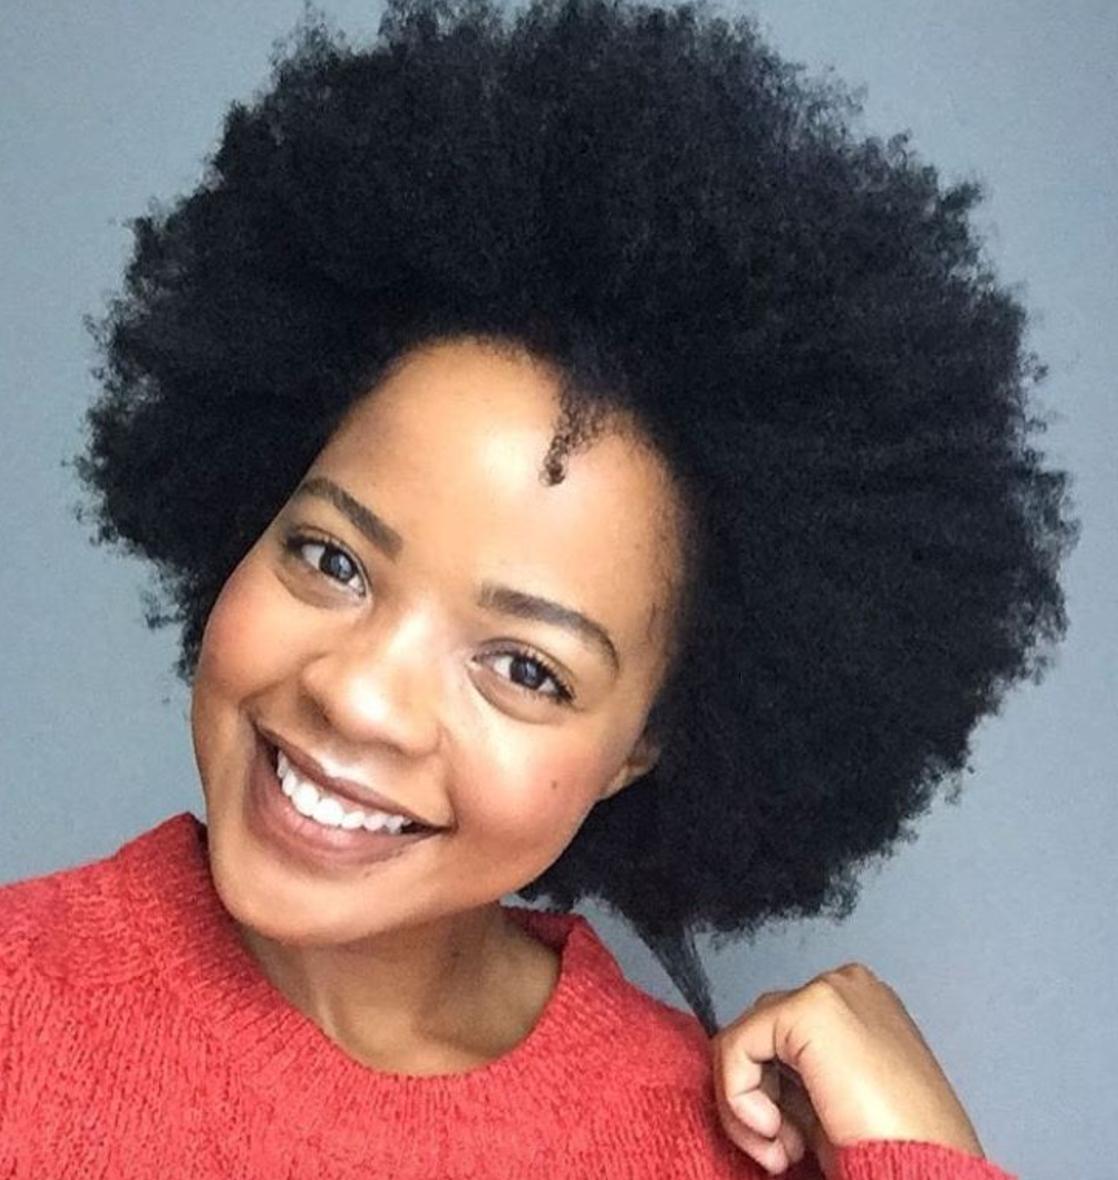 Tips for Blending Hair During Transitions